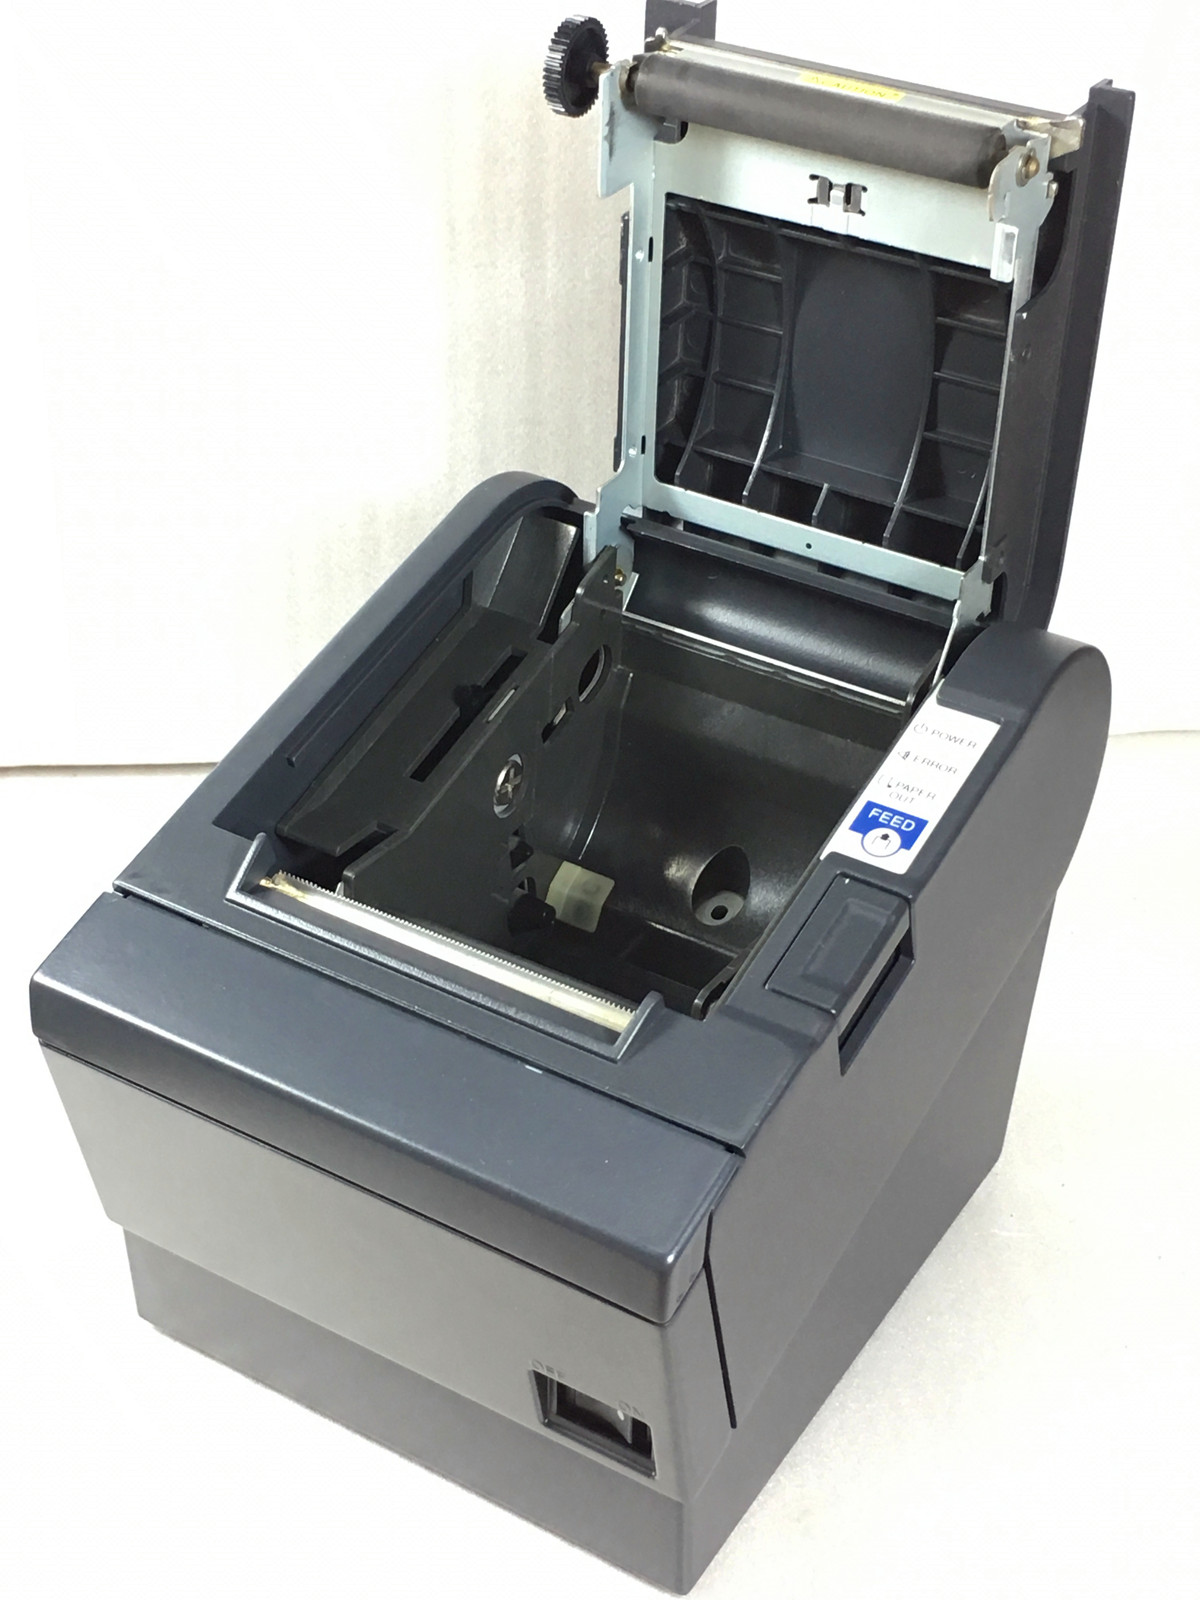 Epson TM-T88III M129C Serial POS Thermal Receipt Printer